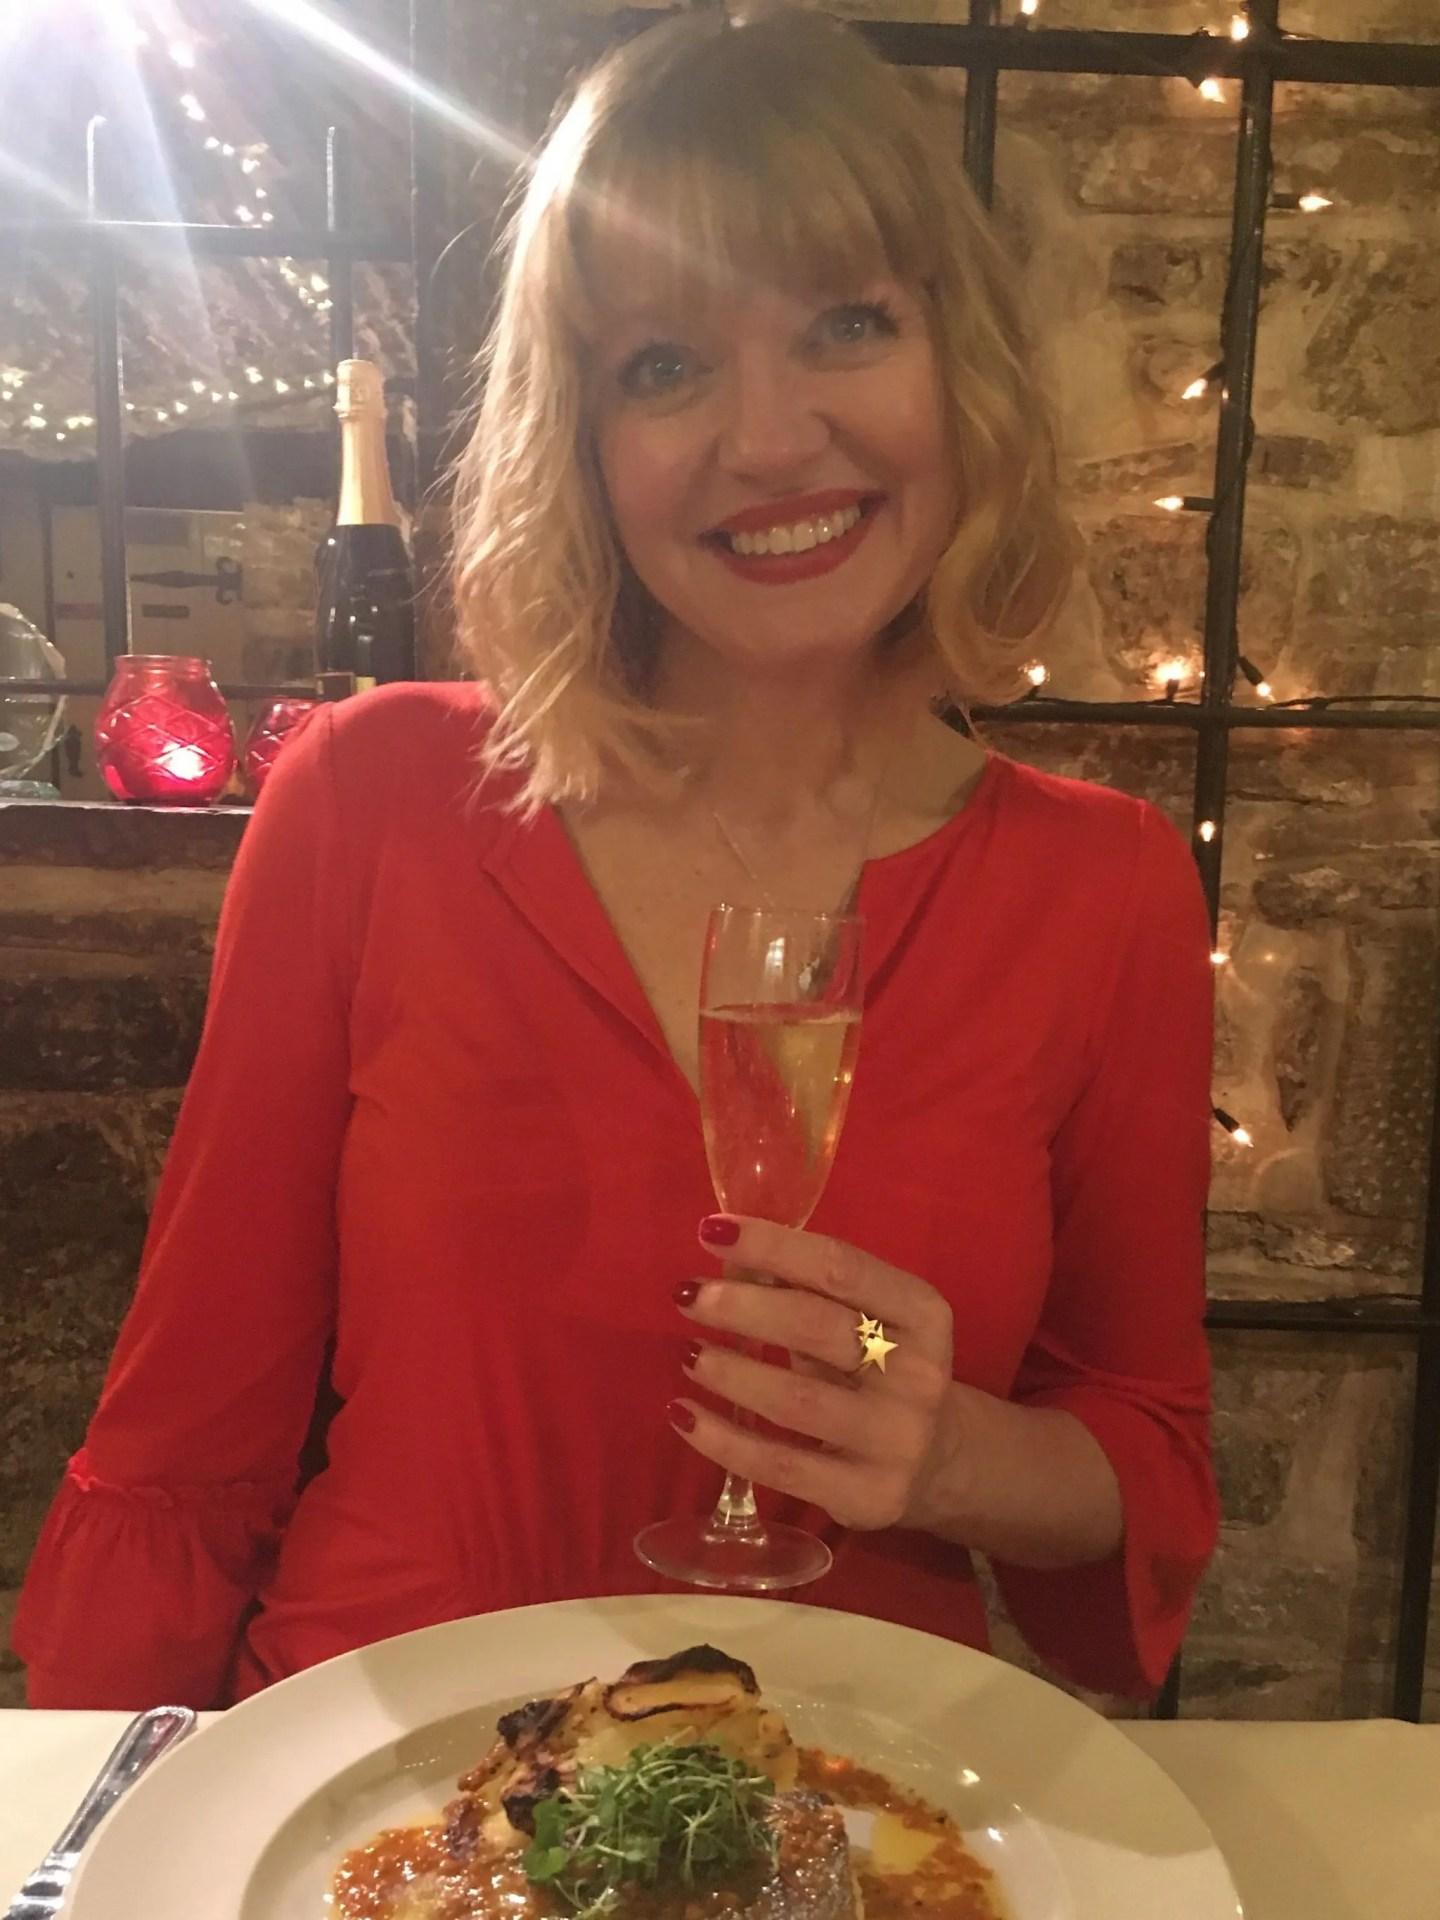 what-lizzy-loves-le-caveau- red-dress